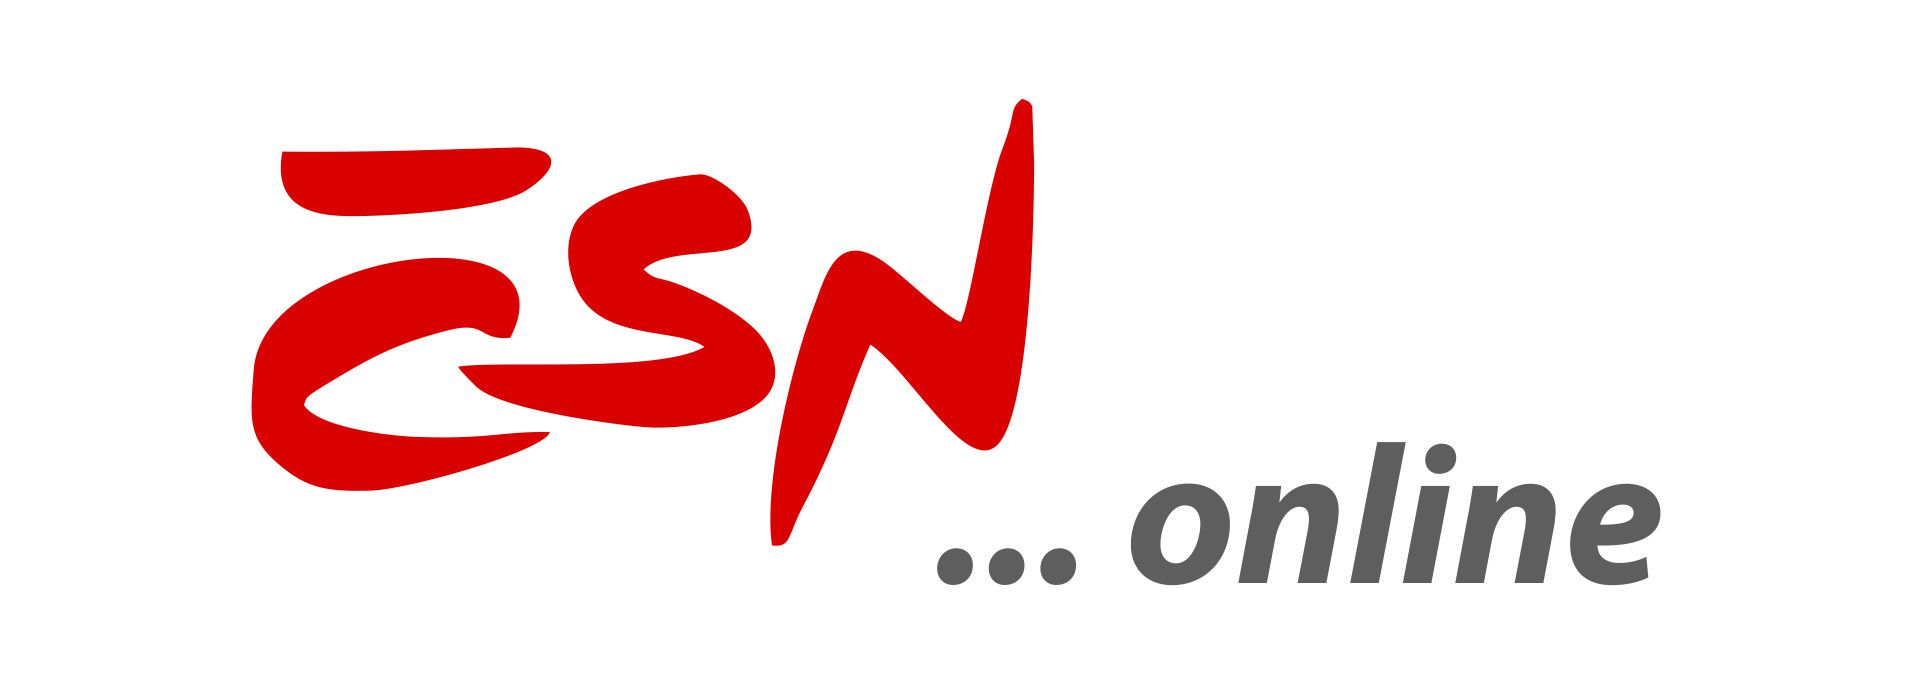 ČSN online logo